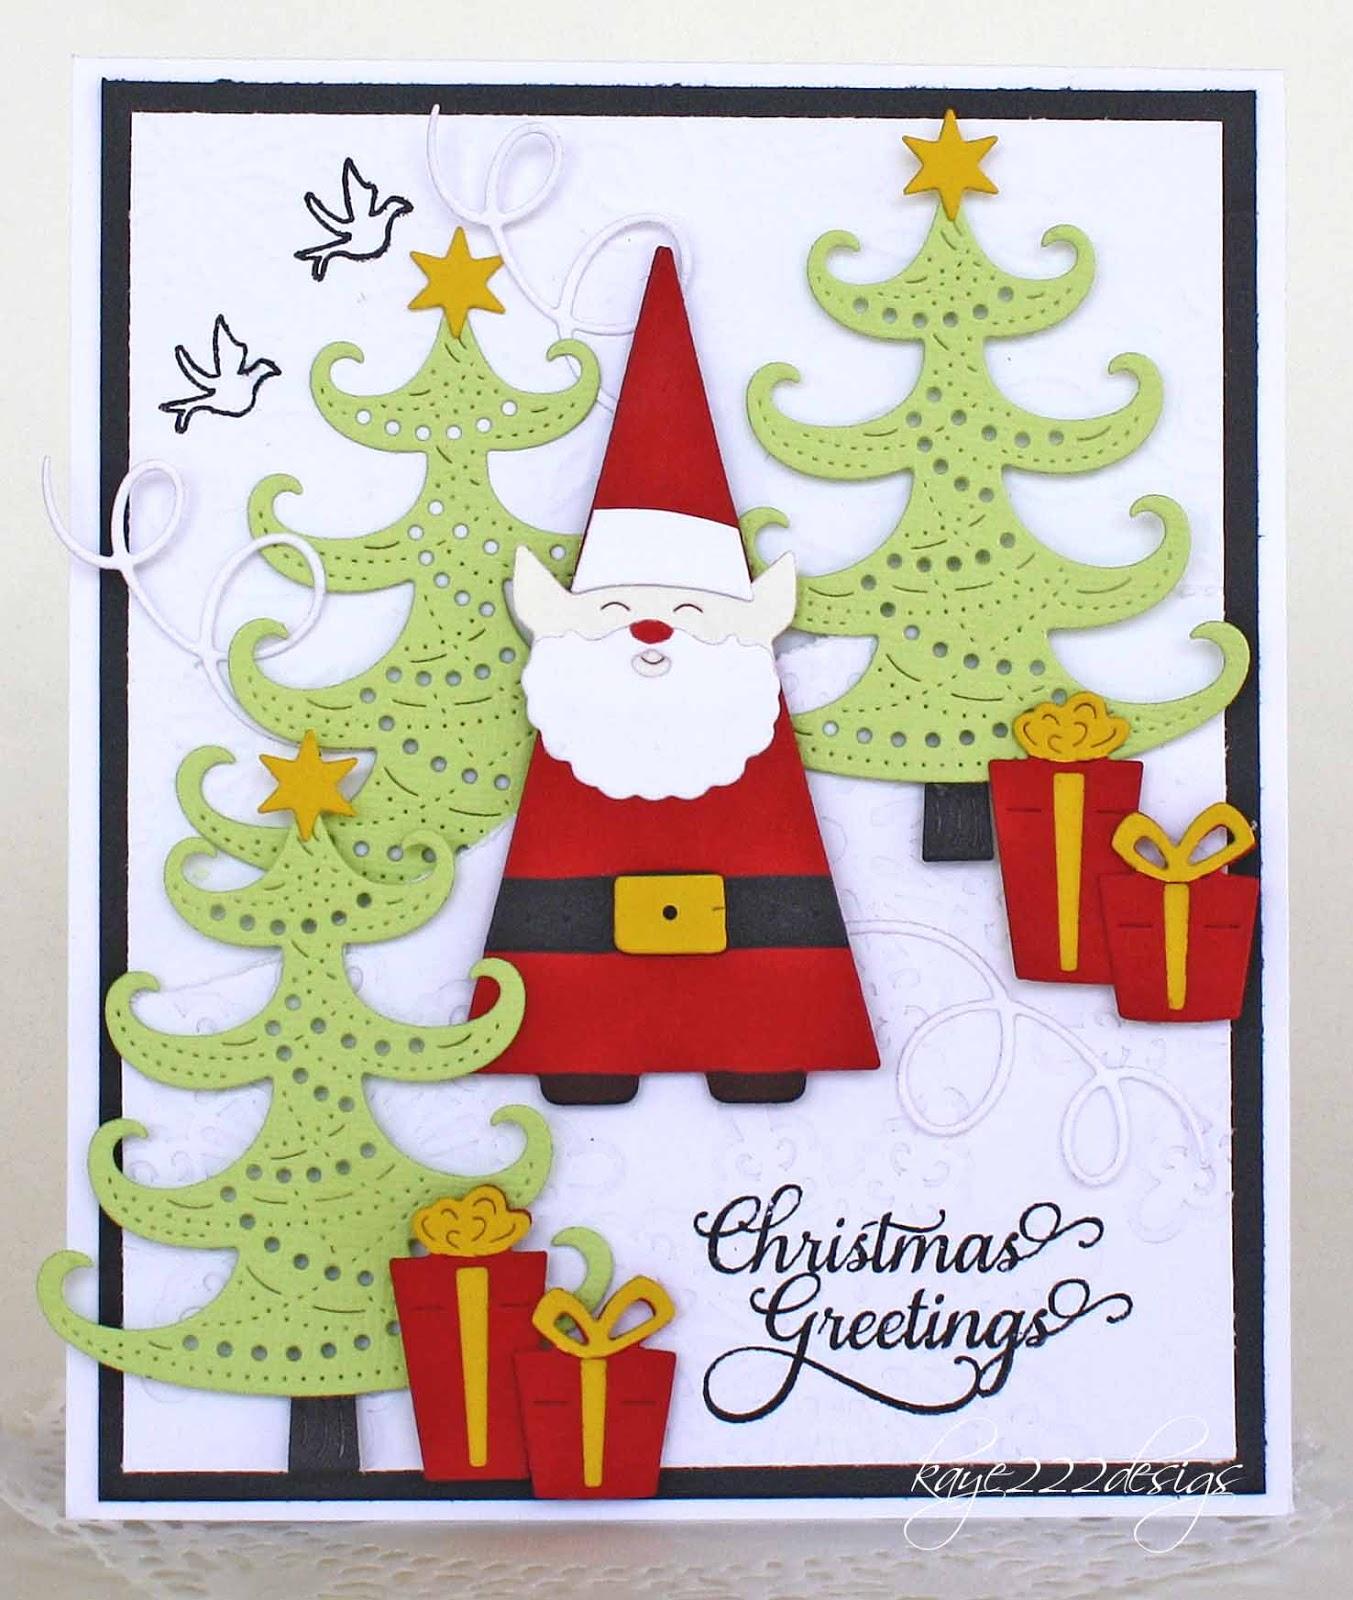 Cheery Lynn Designs Santa & Elf에 대한 이미지 검색결과